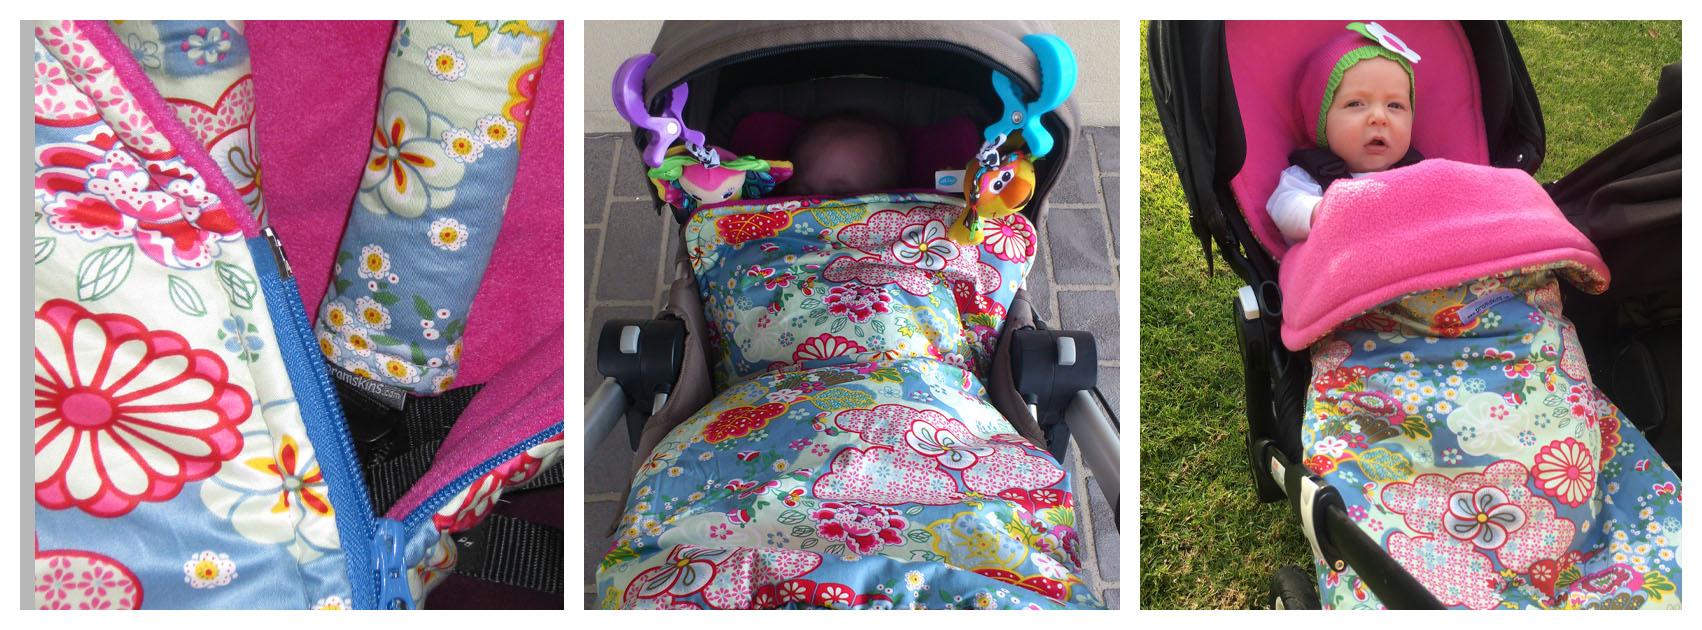 snuggle-bag-footmuff-baby-jogger-kimono-blue.jpg